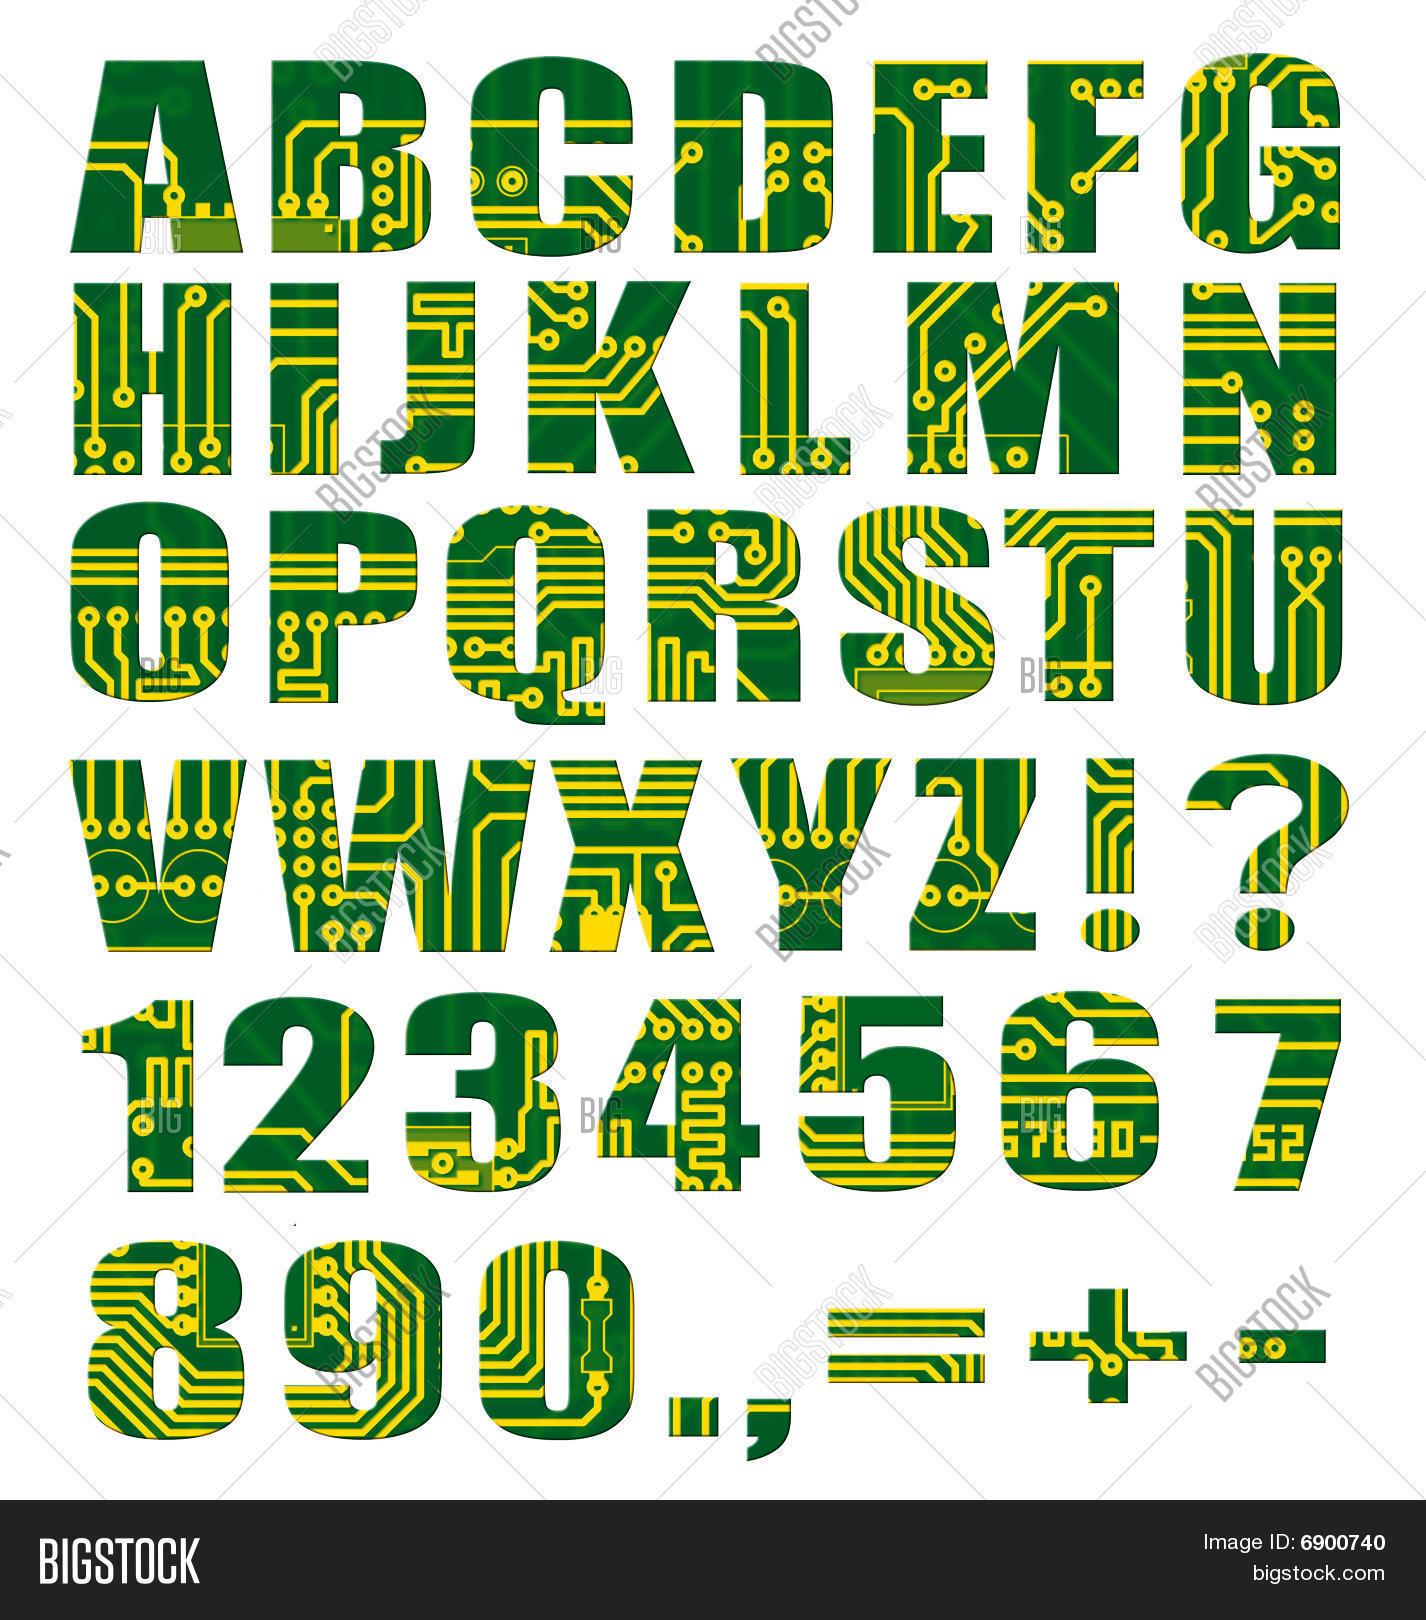 Electronic Alphabet Image & Photo (Free Trial) | Bigstock